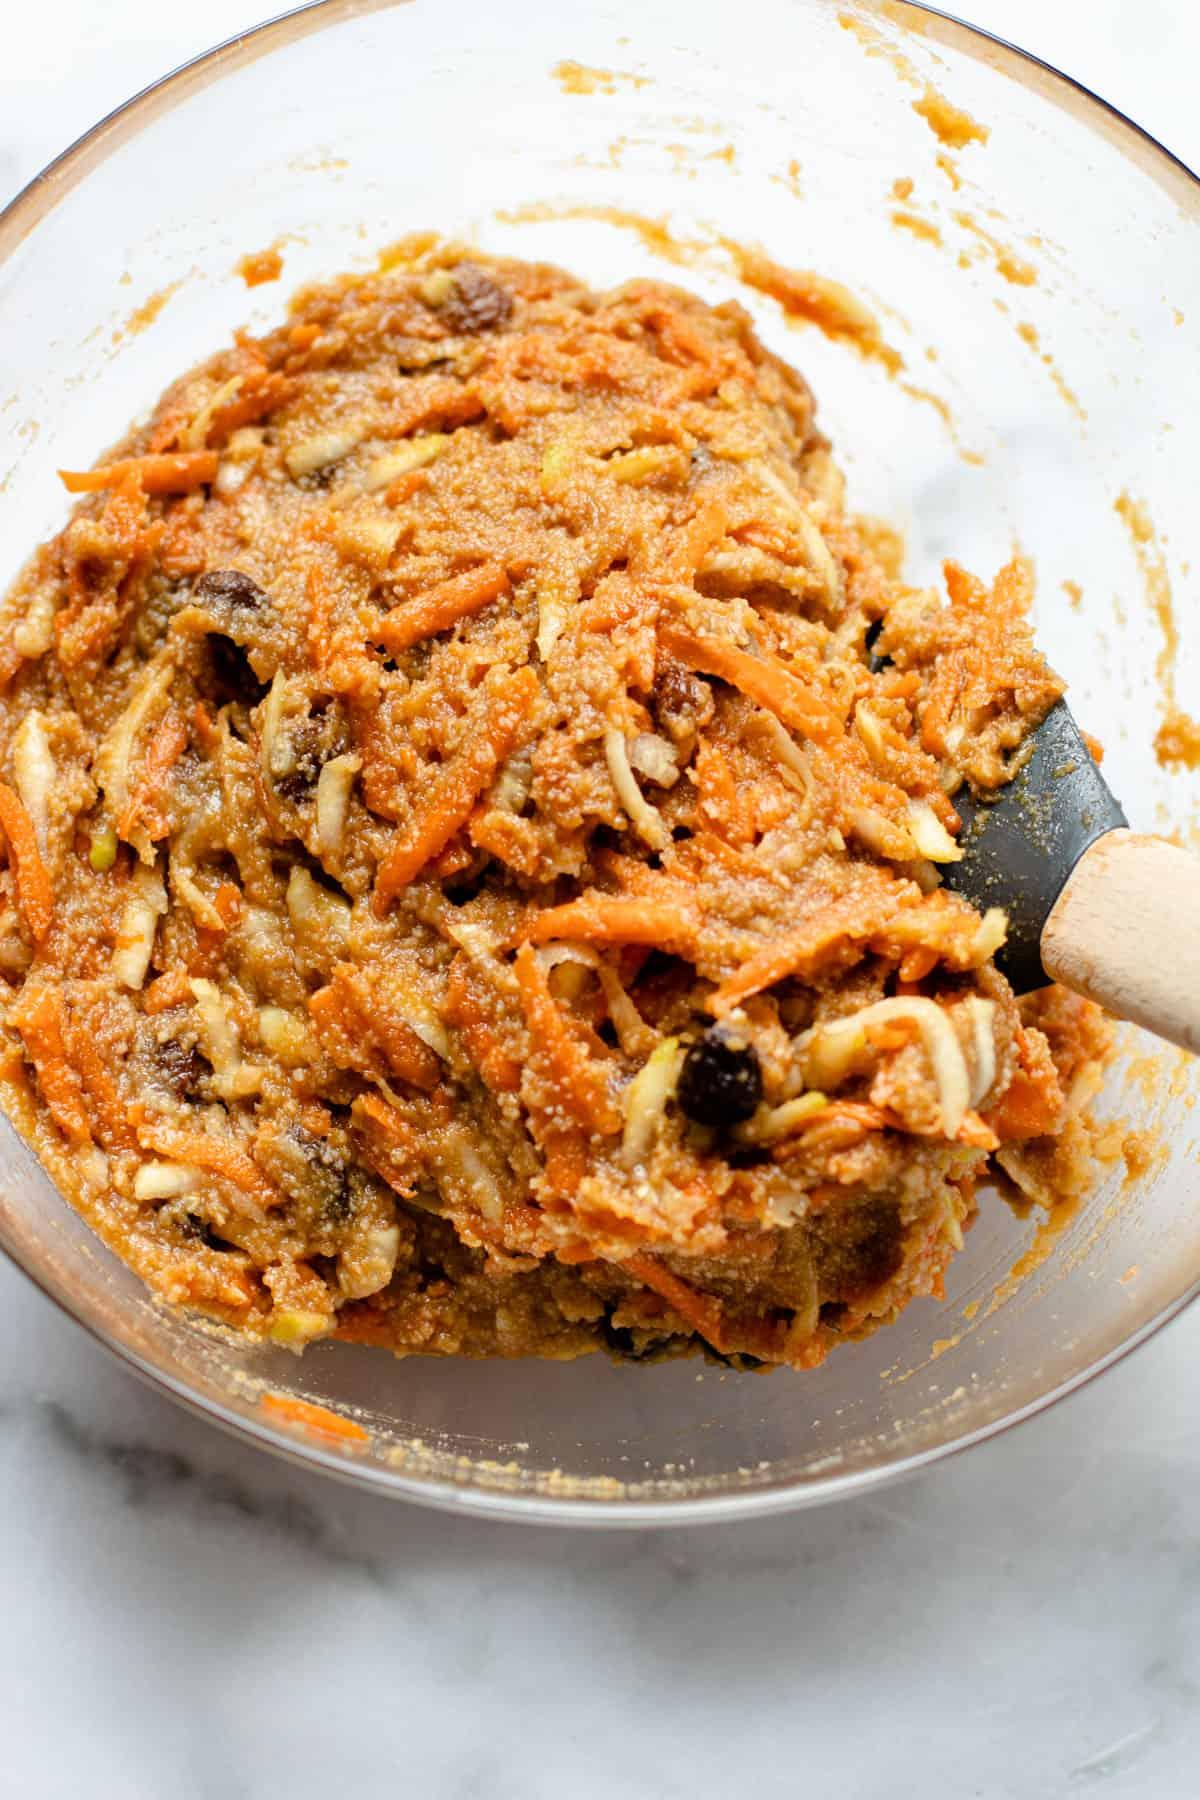 Zucchini carrot bar batter in a bowl.